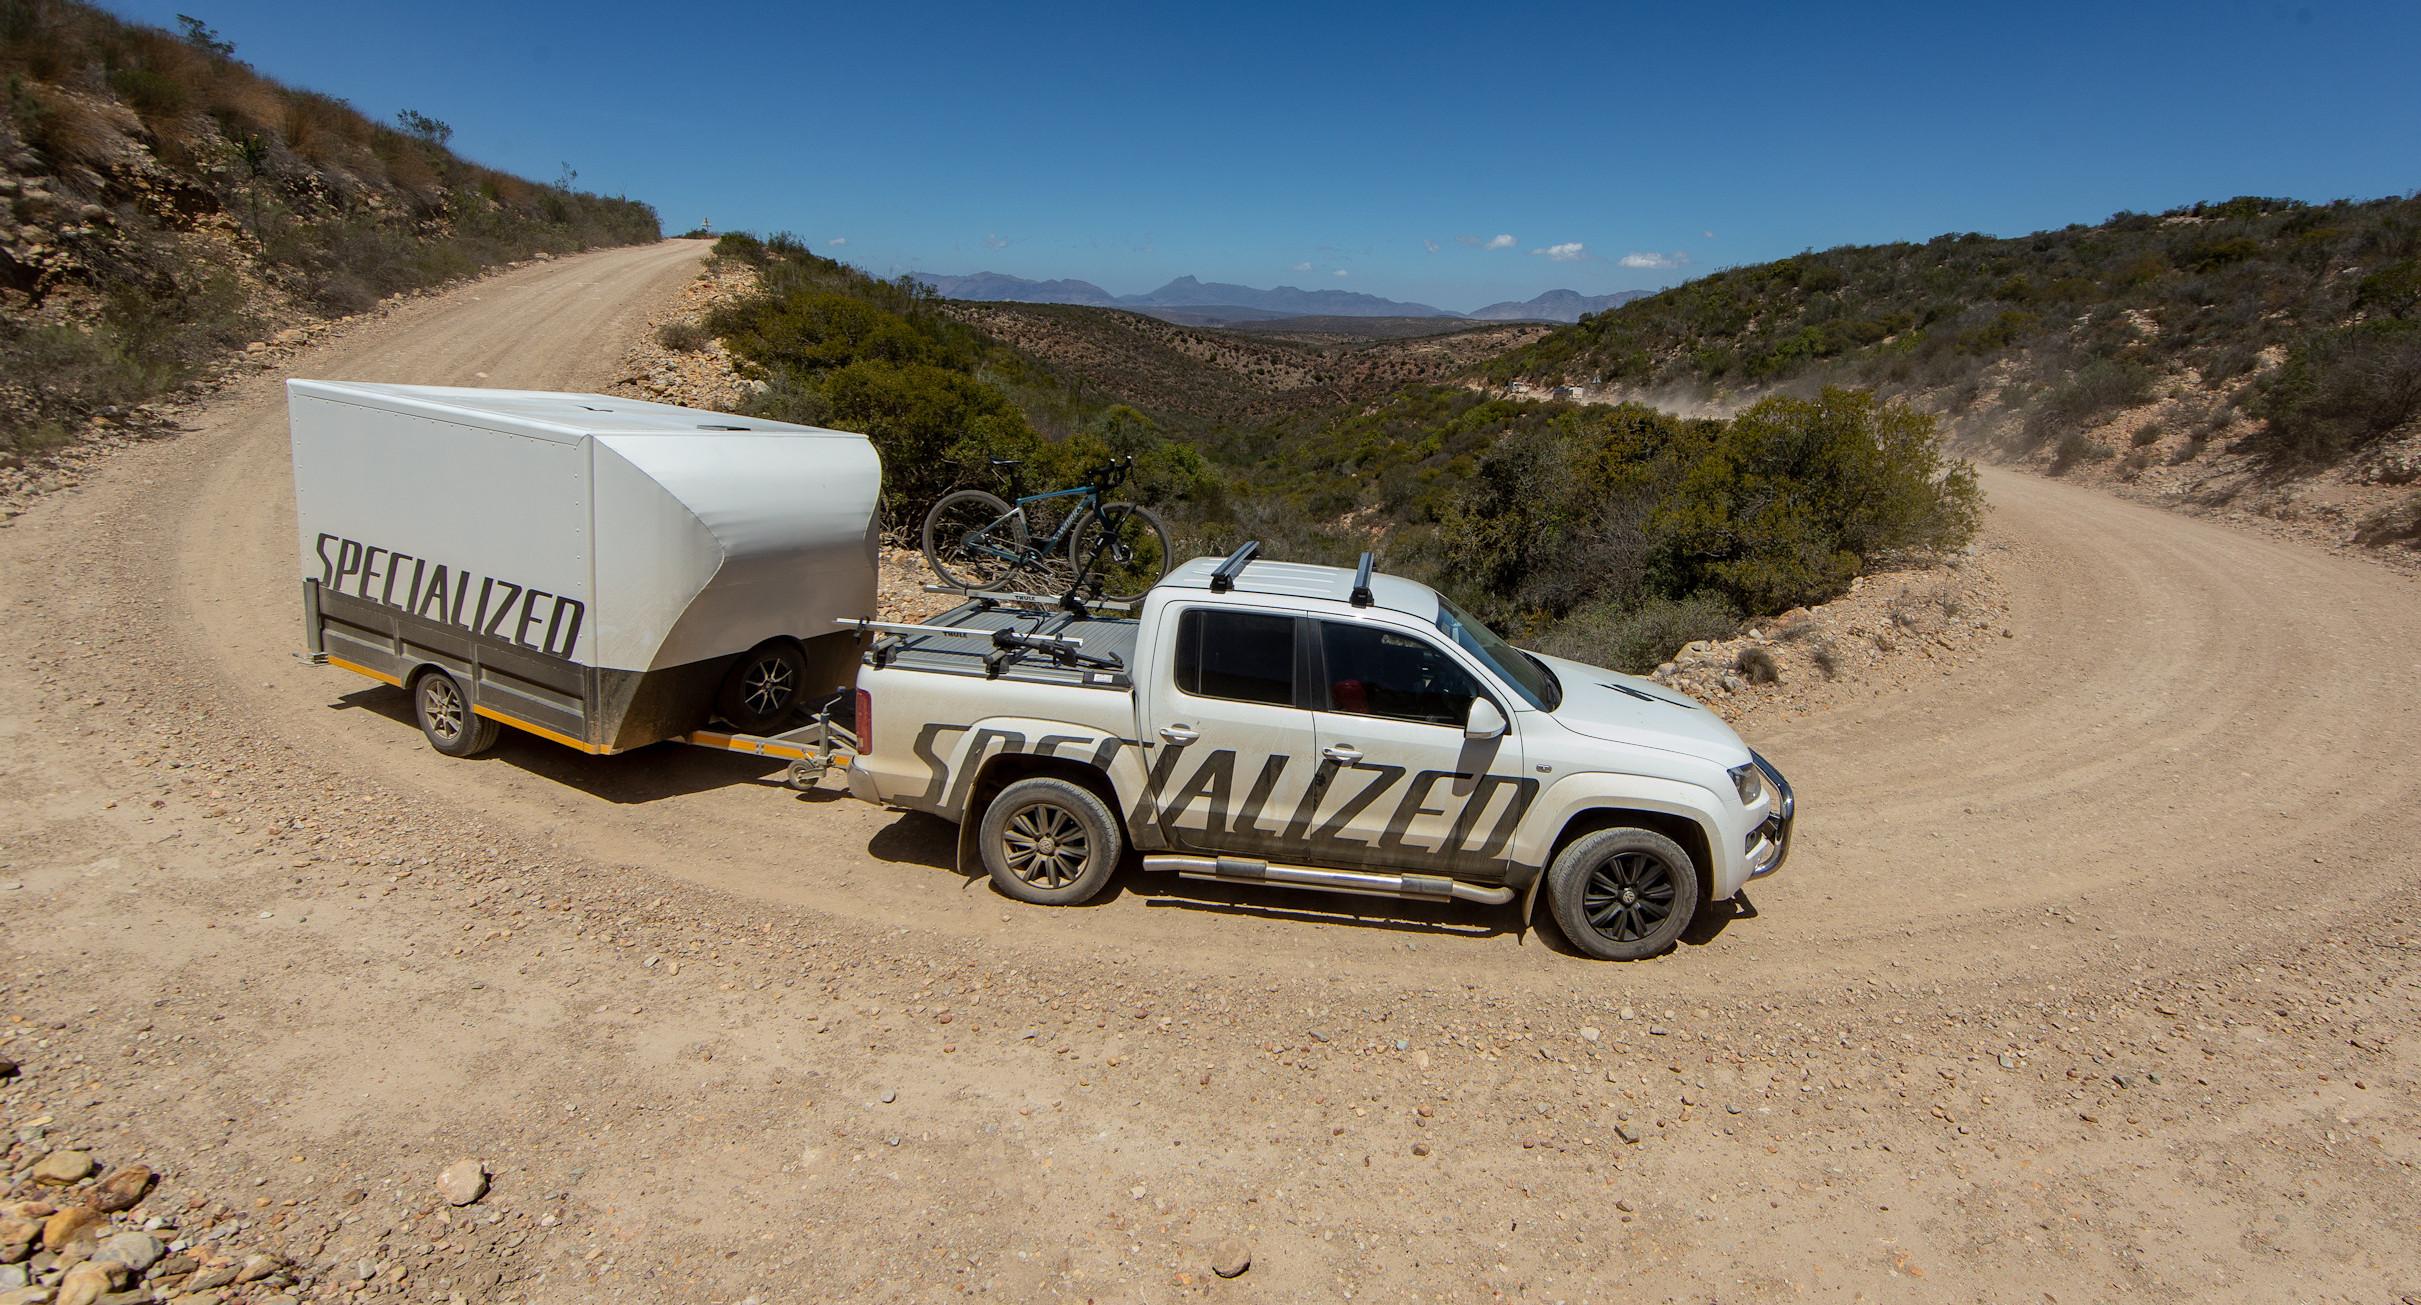 Cruising along off the beaten track. (Image courtesy Specialize ZA)